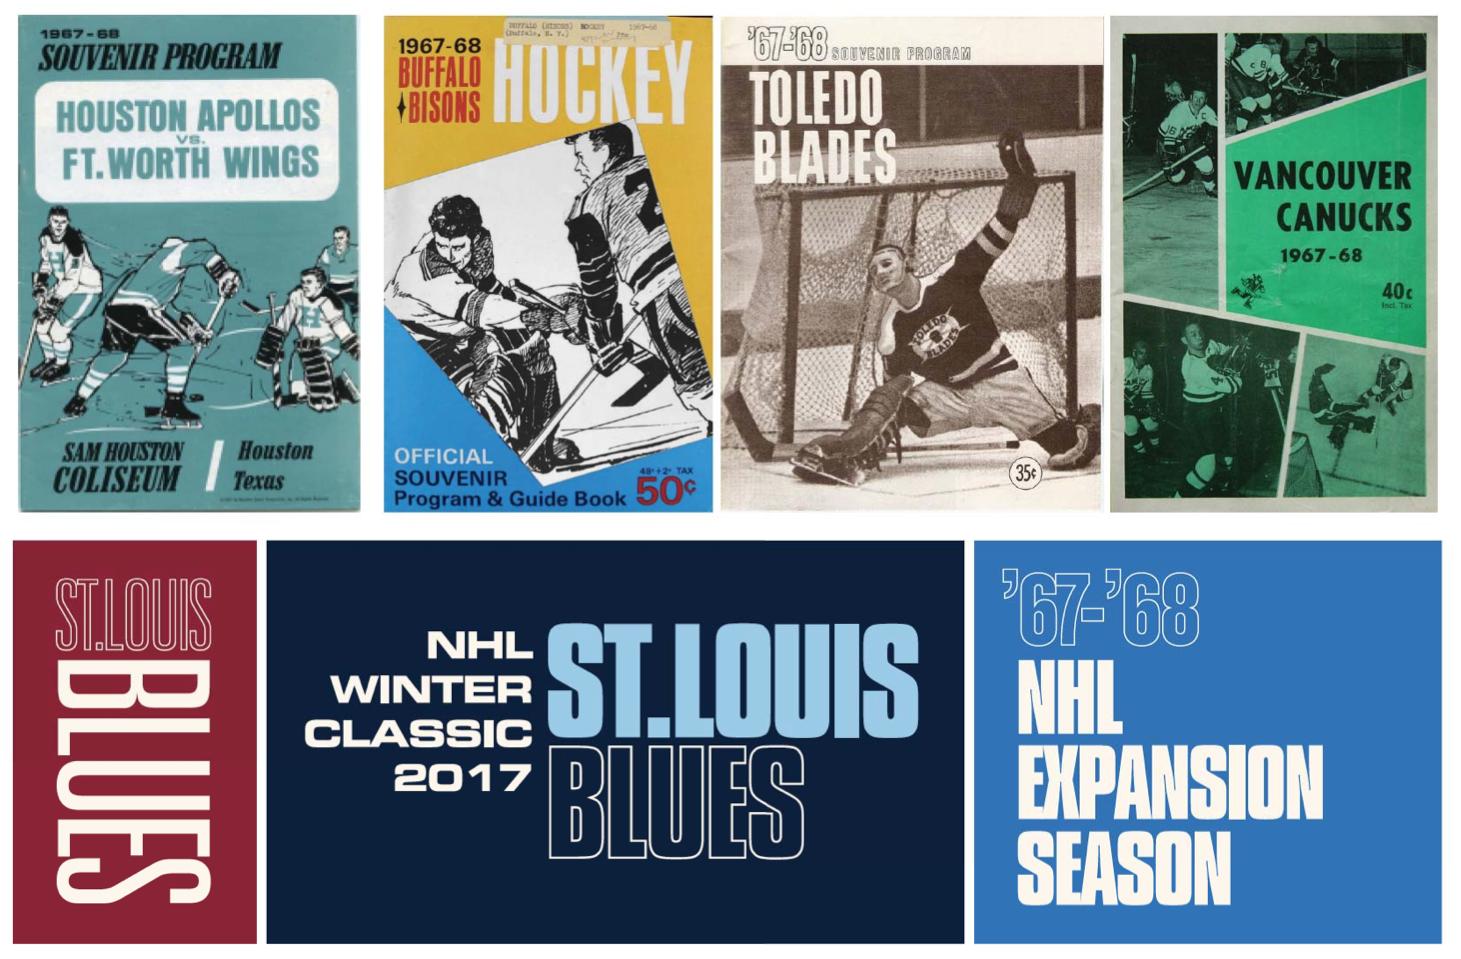 Theme art inspiration based on the 1968 season program covers.